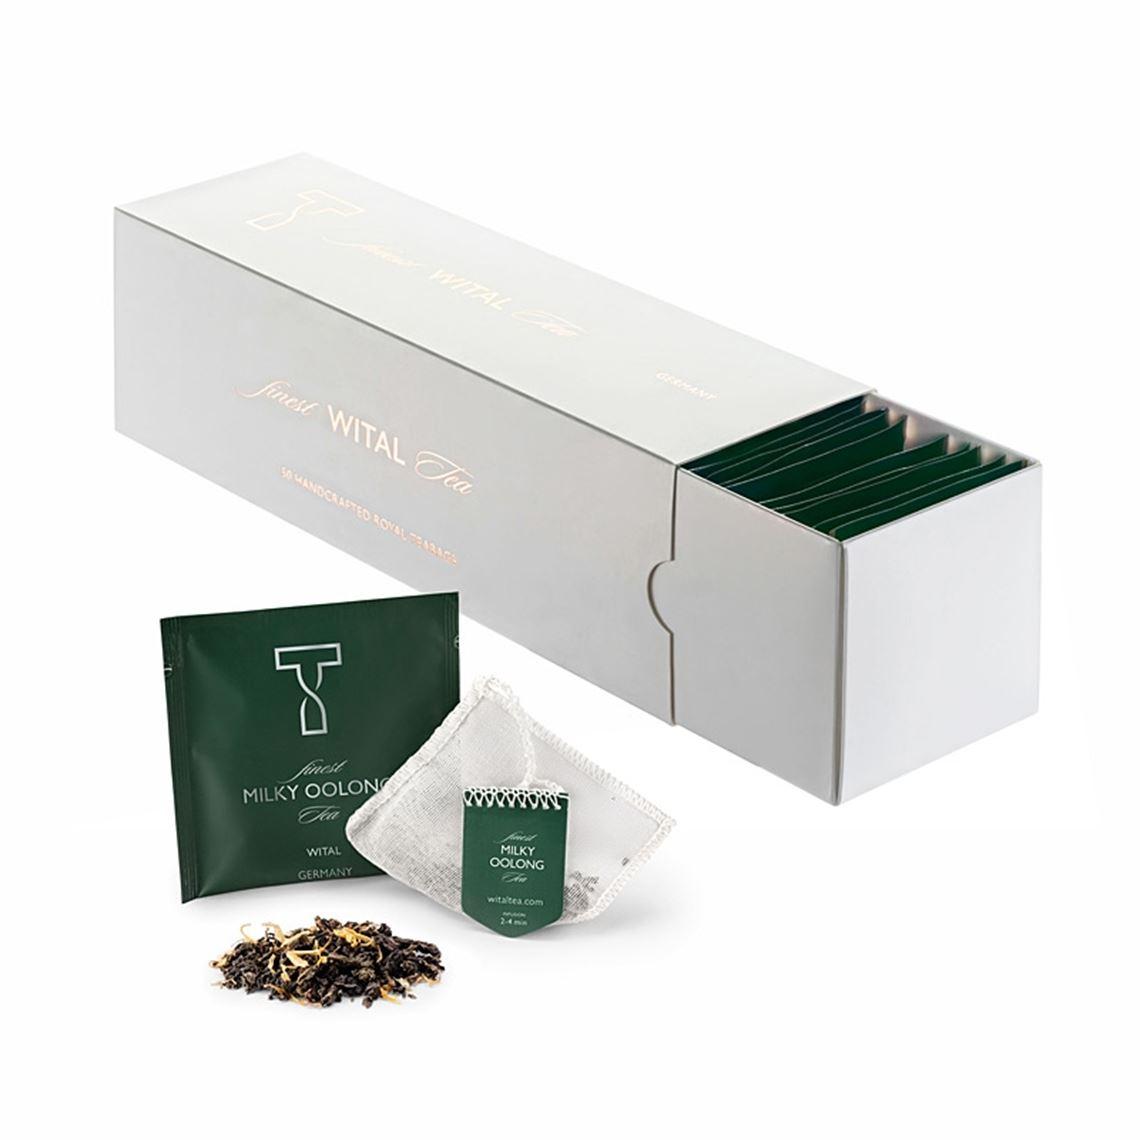 Wital Finest tea HoReCa Milky Oolong 50x2,5g